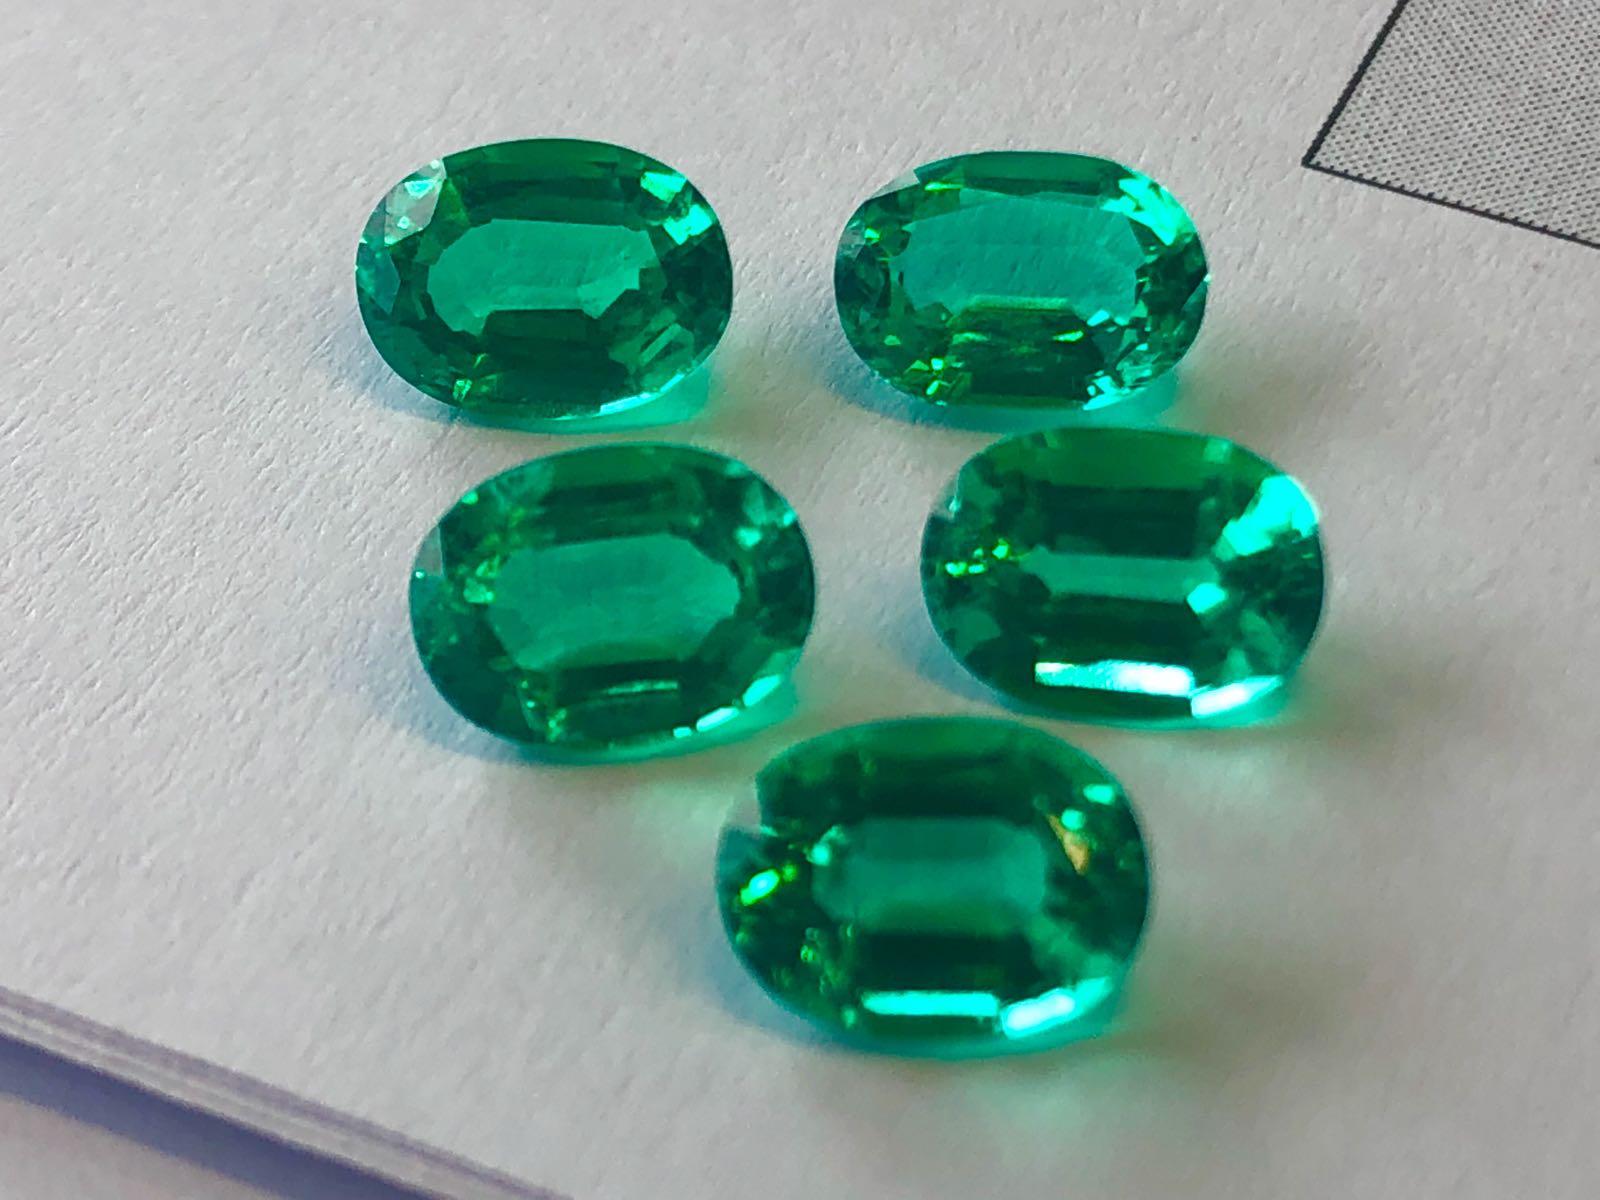 lab created columbian emerald - Wholesale Gemstones & Jewelry - Semi